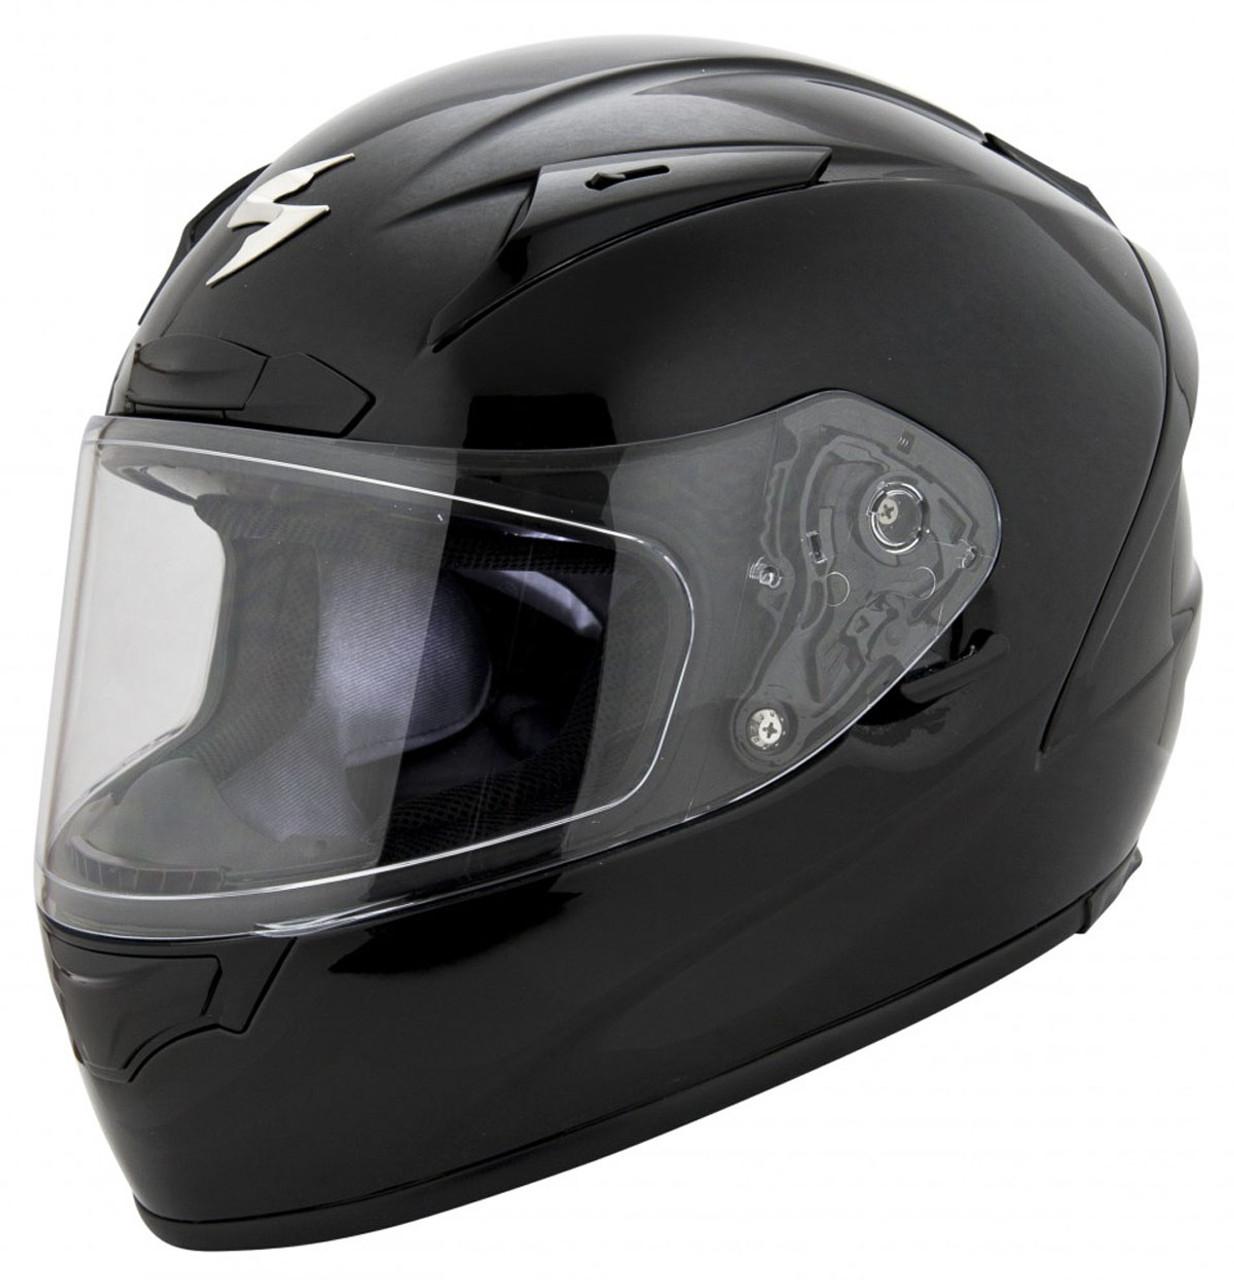 scorpion exo r2000 solid helmet. Black Bedroom Furniture Sets. Home Design Ideas